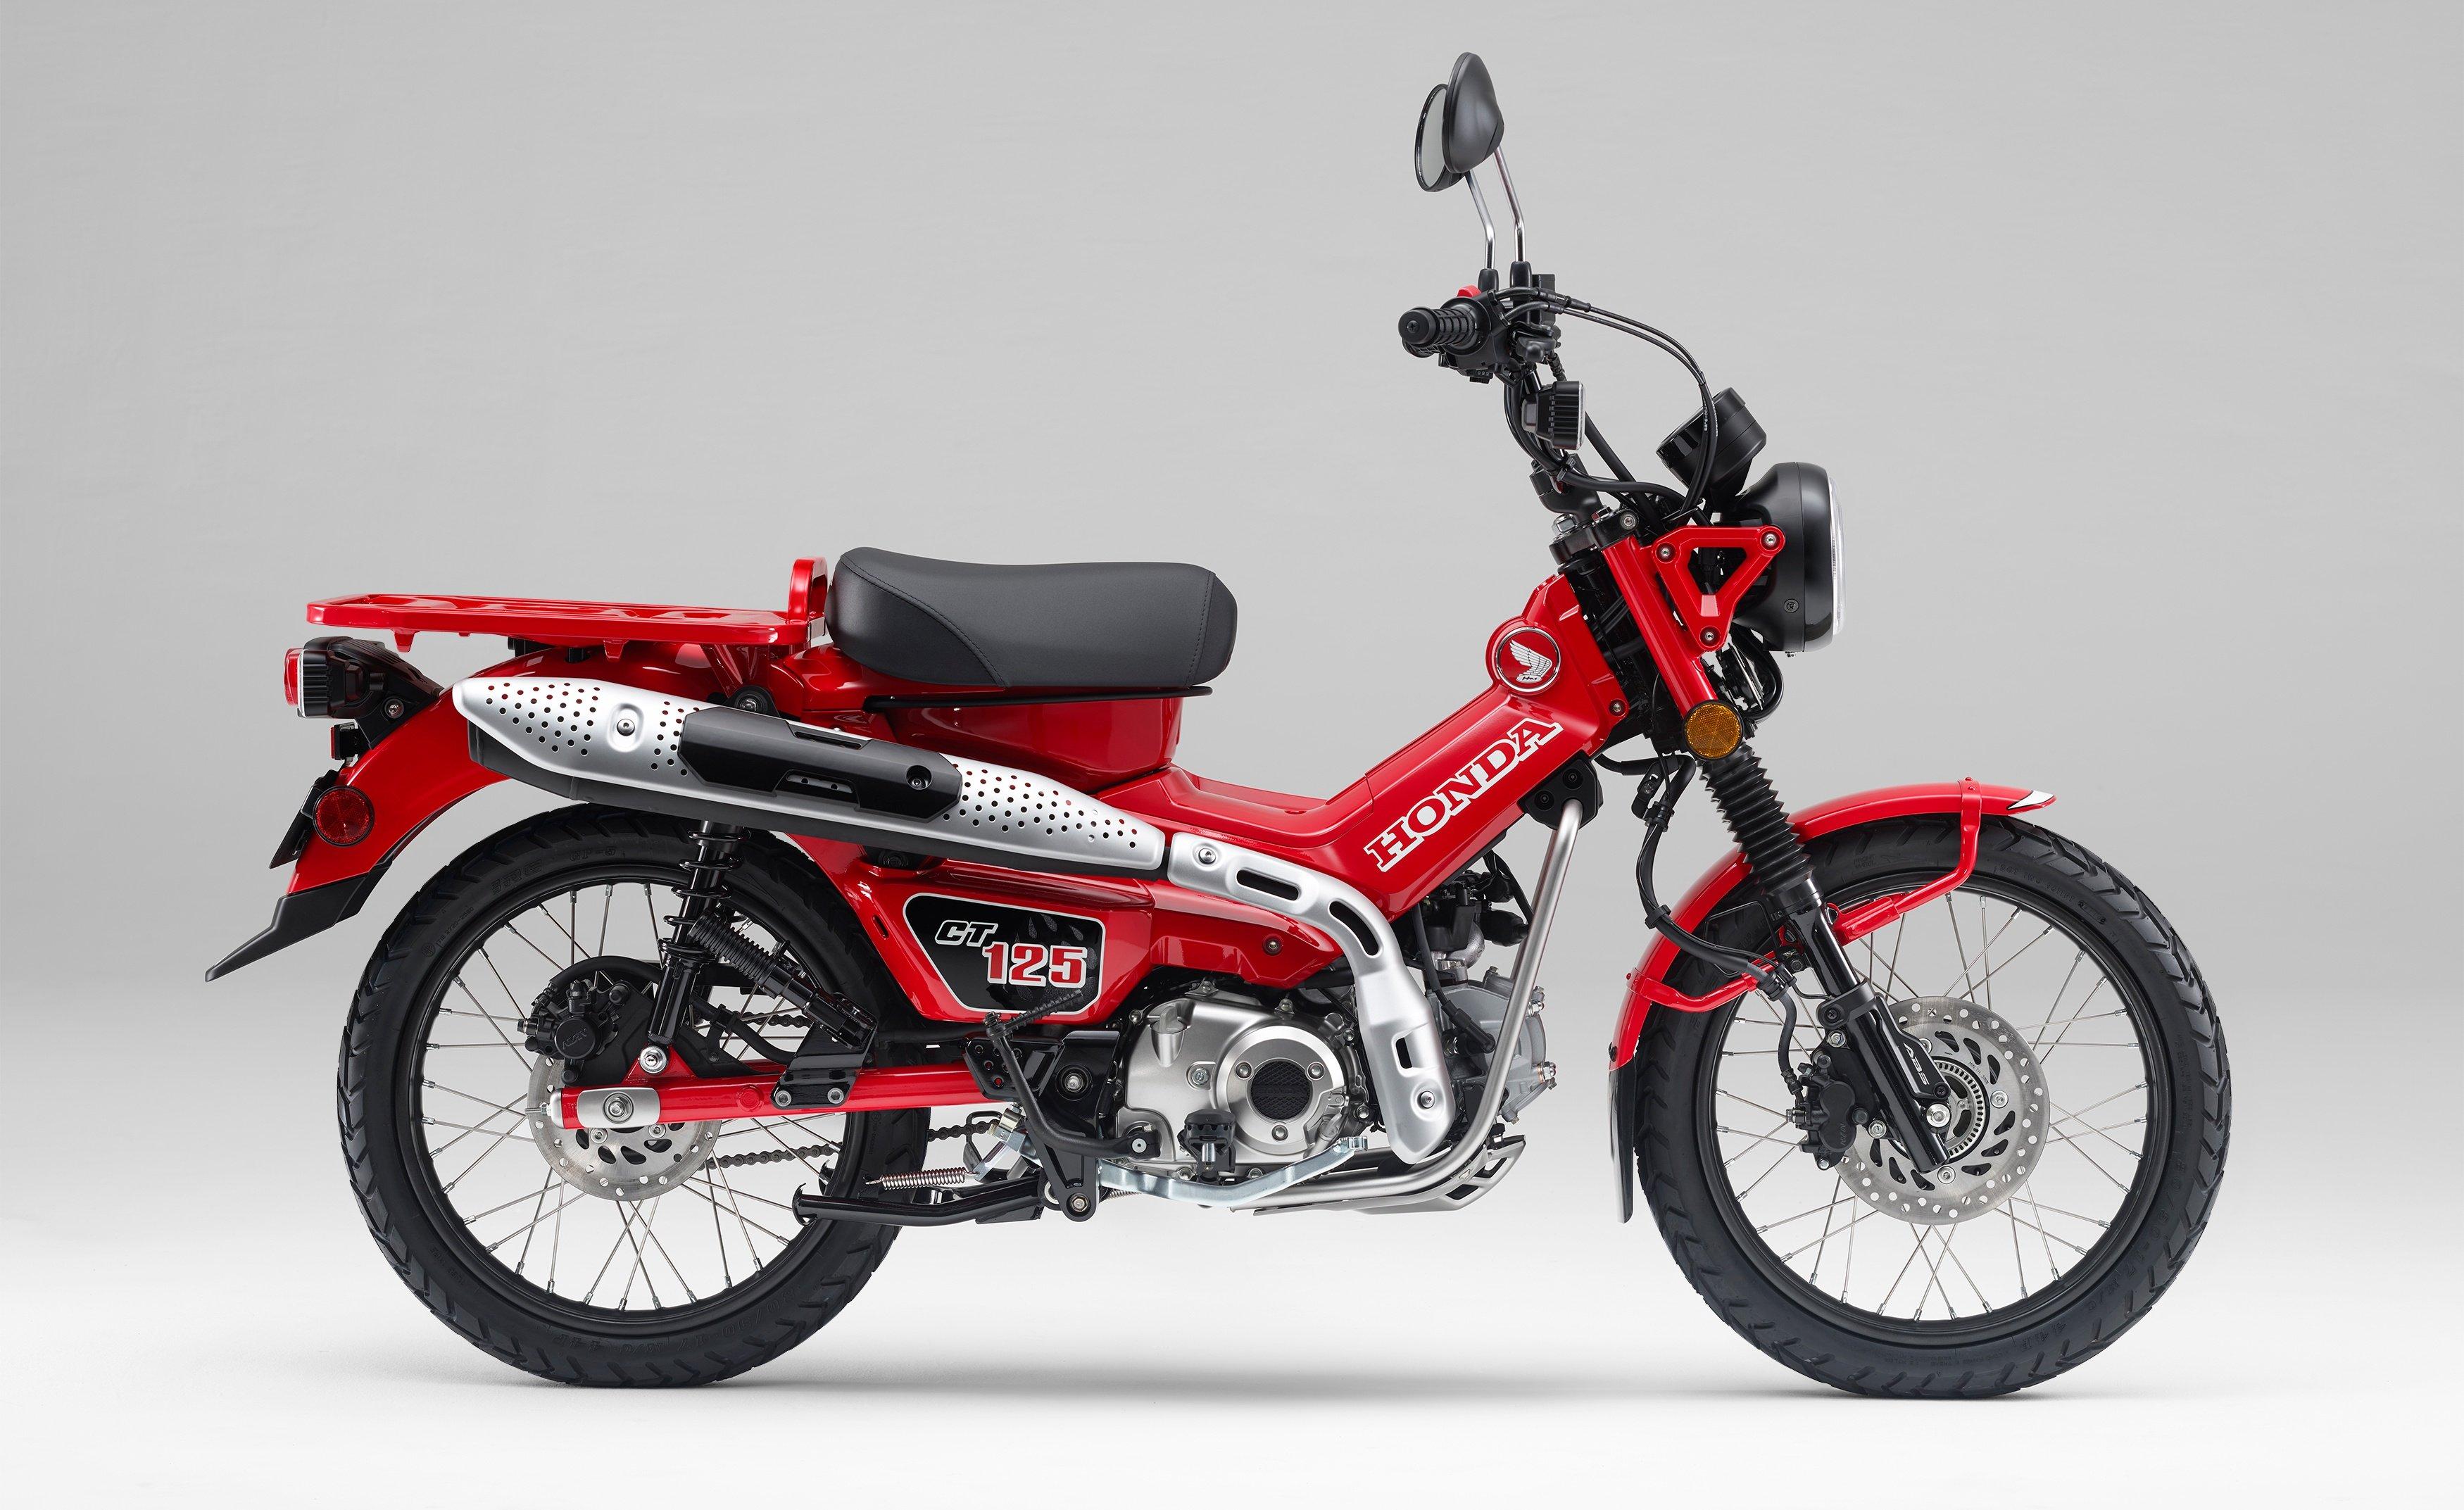 Honda CT125 Trail Cub / Hunter Cub